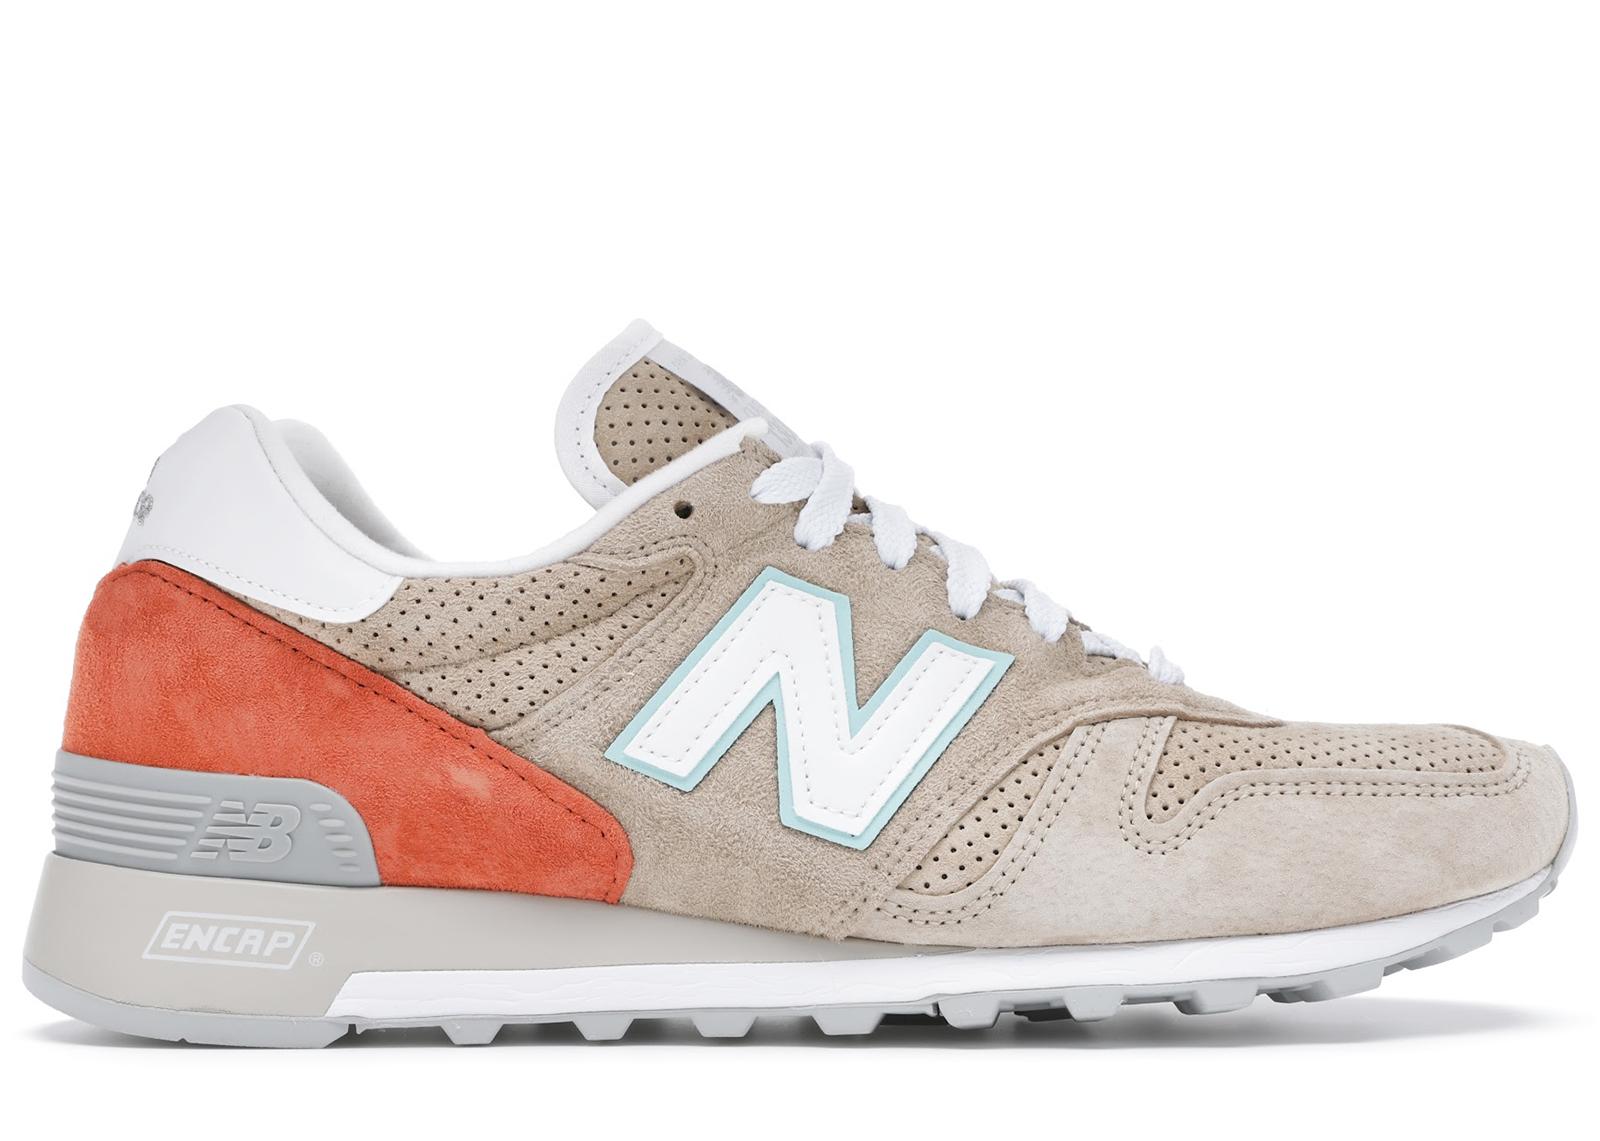 New Balance 1300 Tan Orange